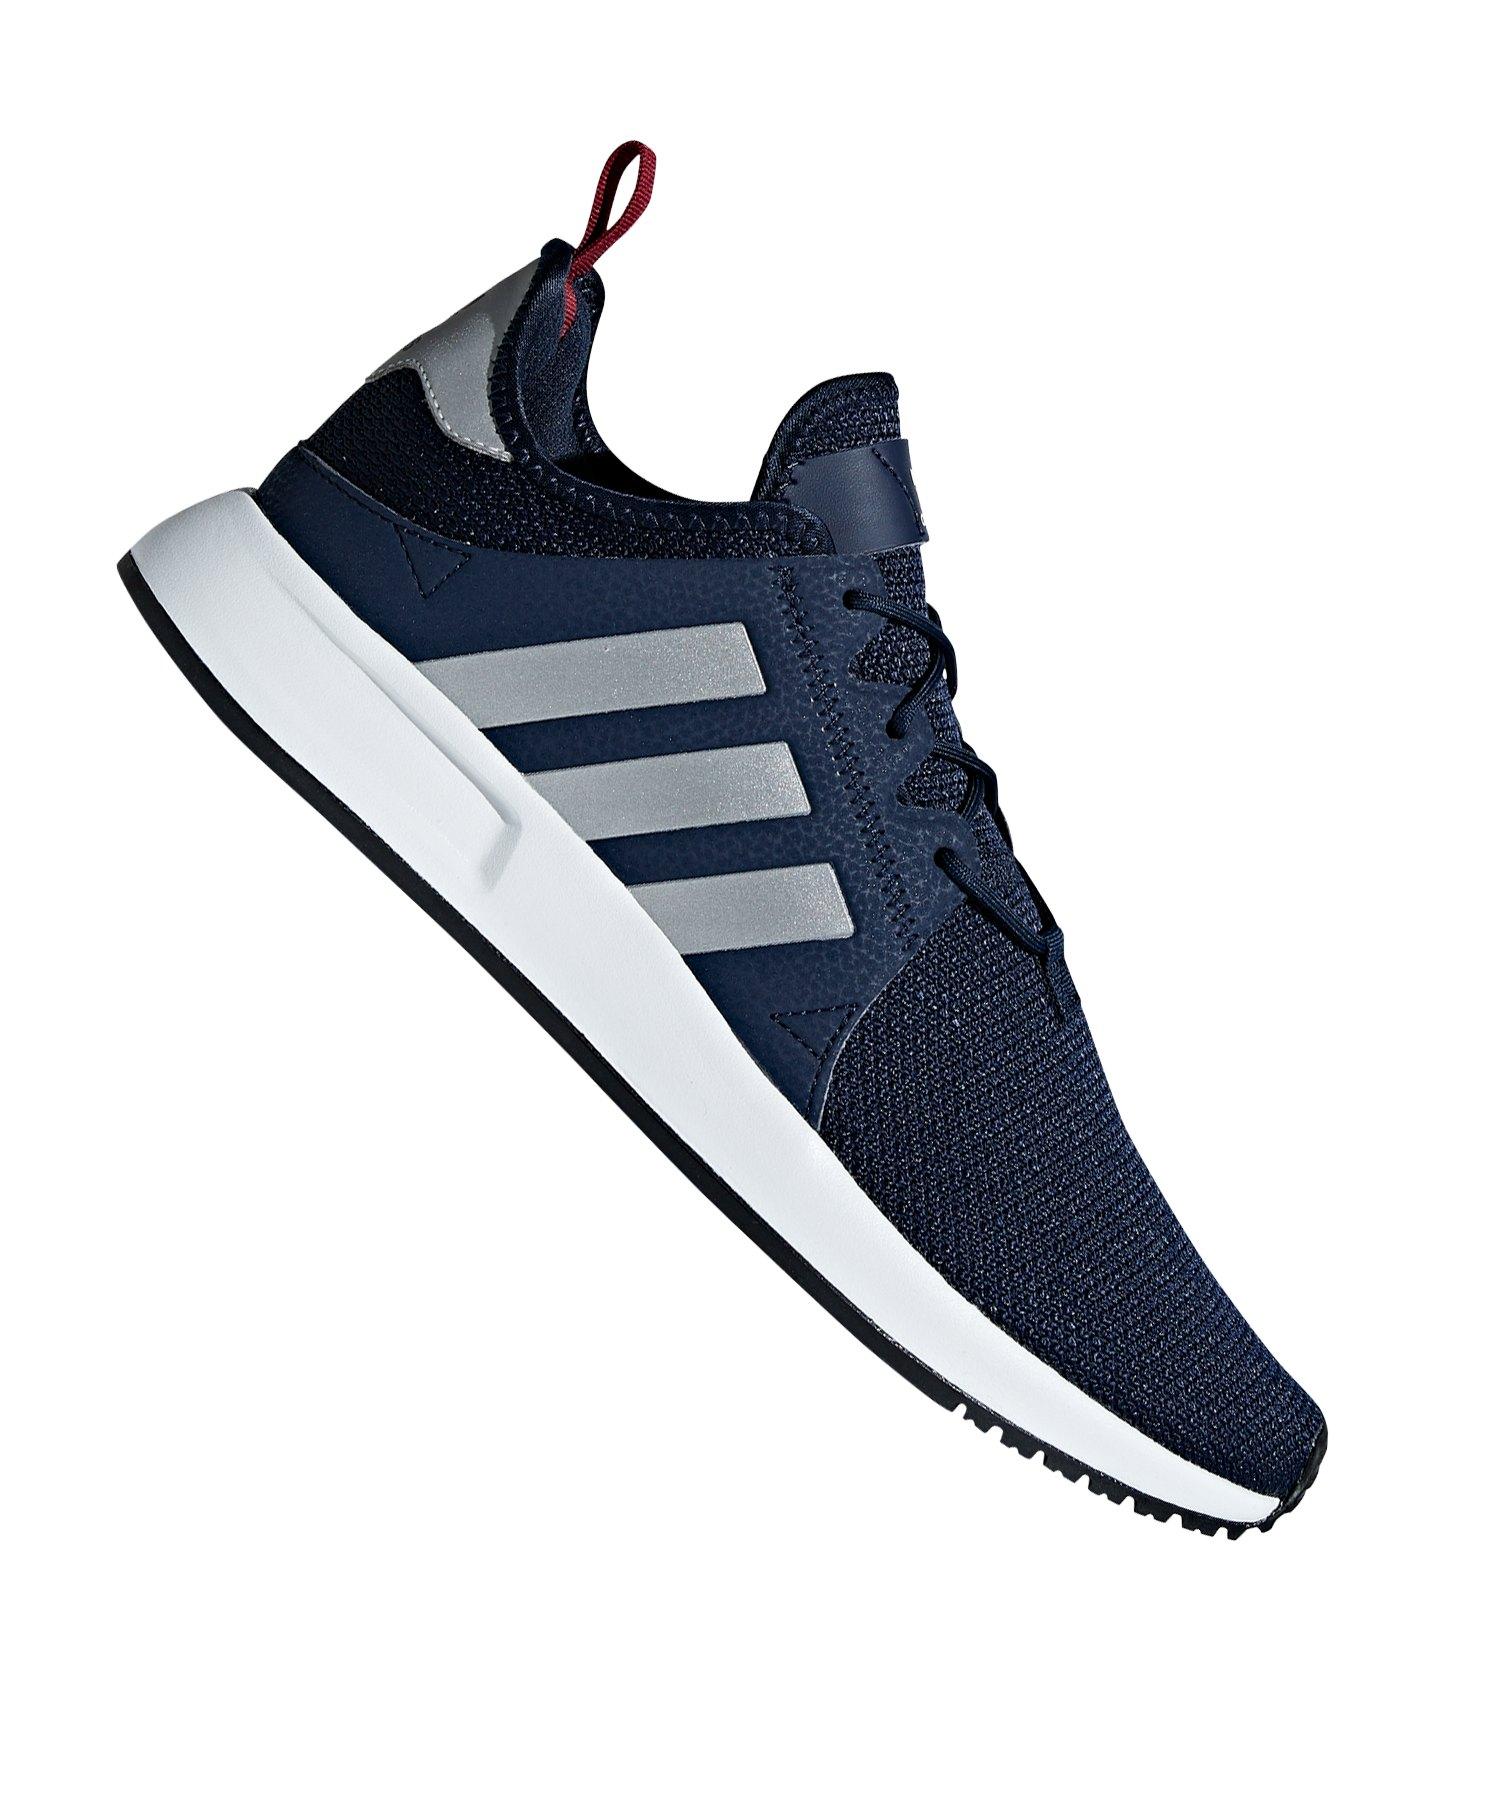 adidas Originals X_PLR Sneaker Blau Silber